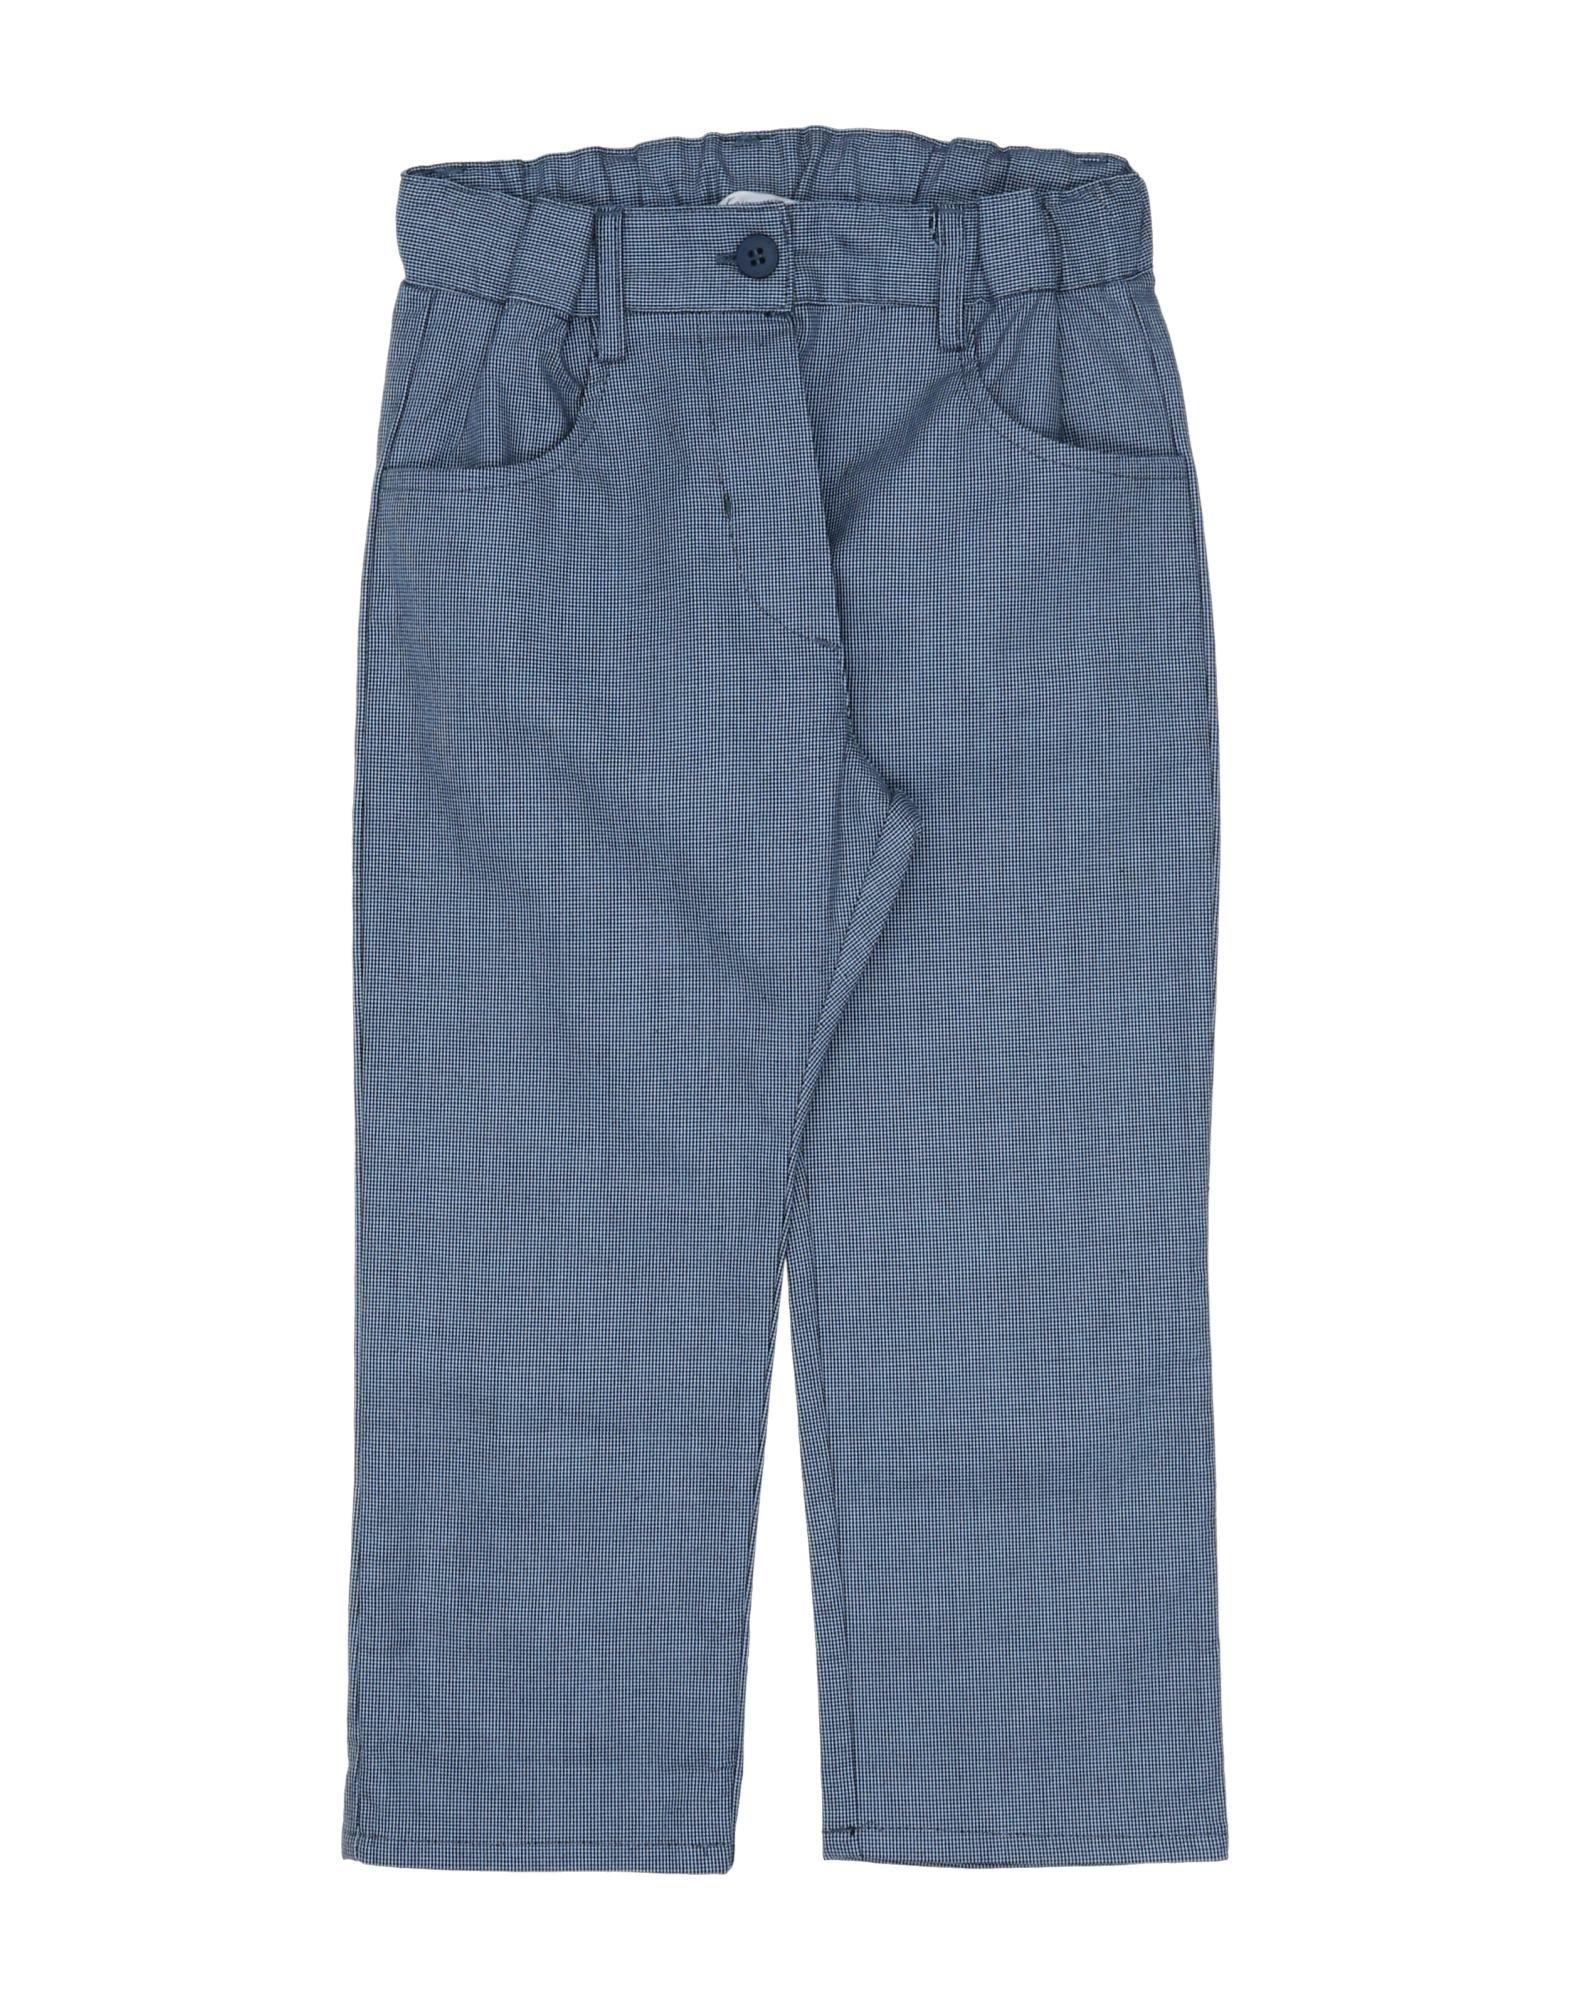 PER TE'' Повседневные брюки sem per lei повседневные брюки